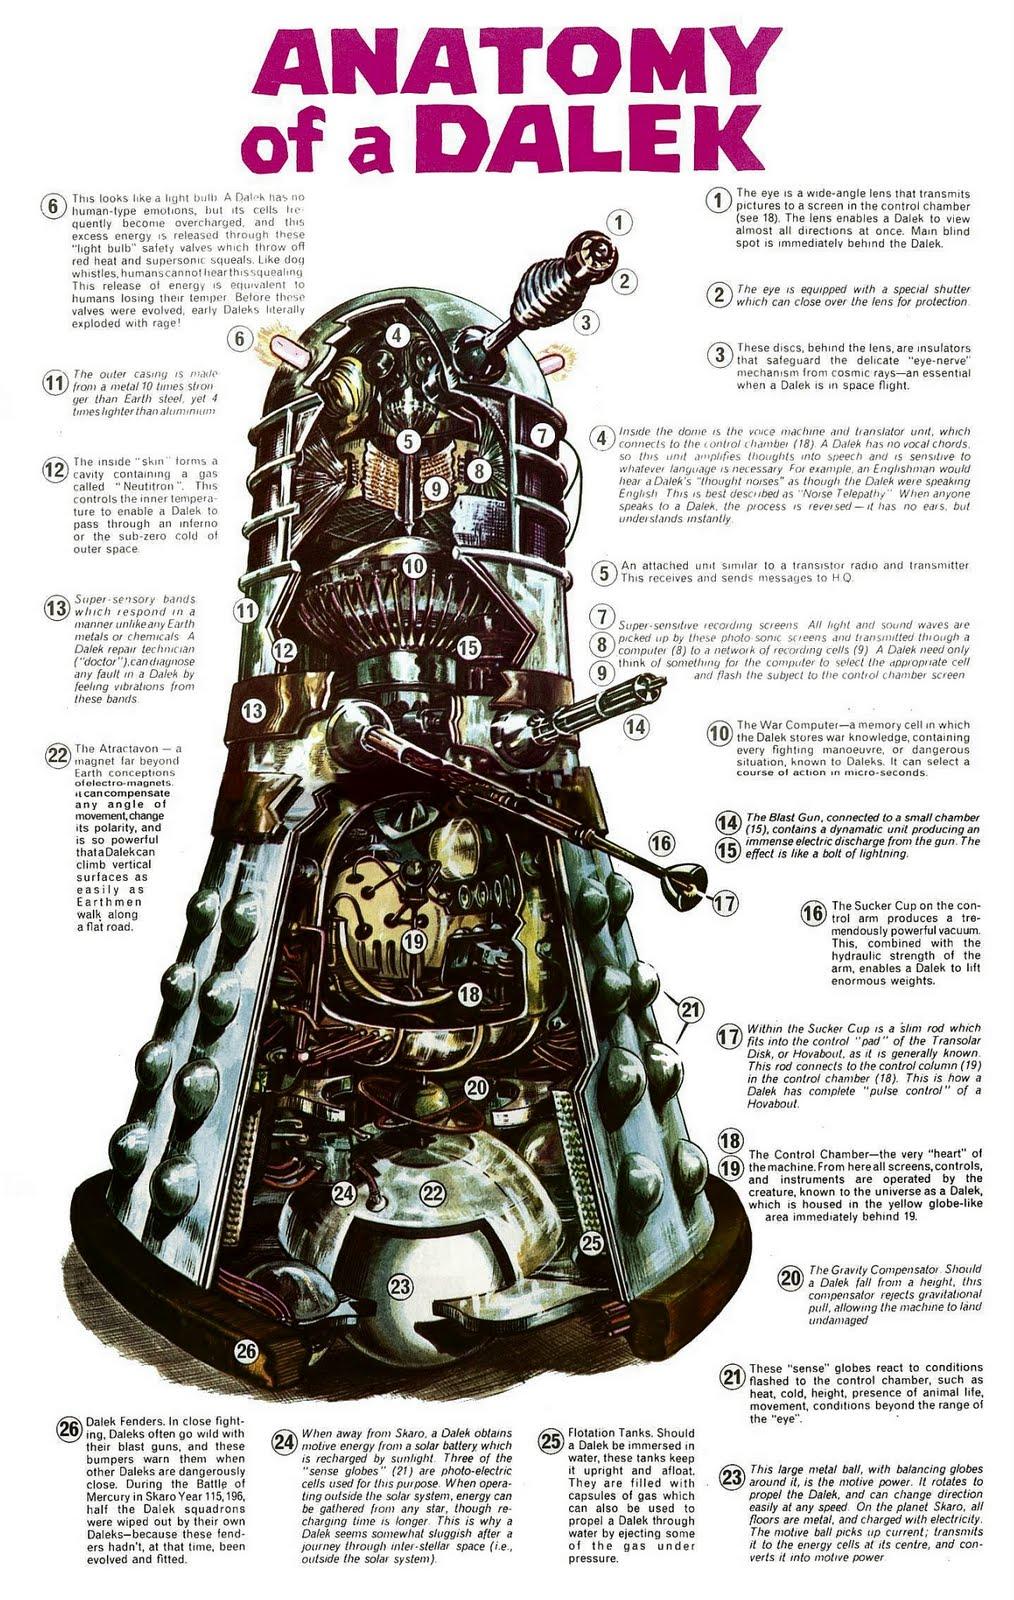 Evolution Of The Cybermen The Translation Circui...